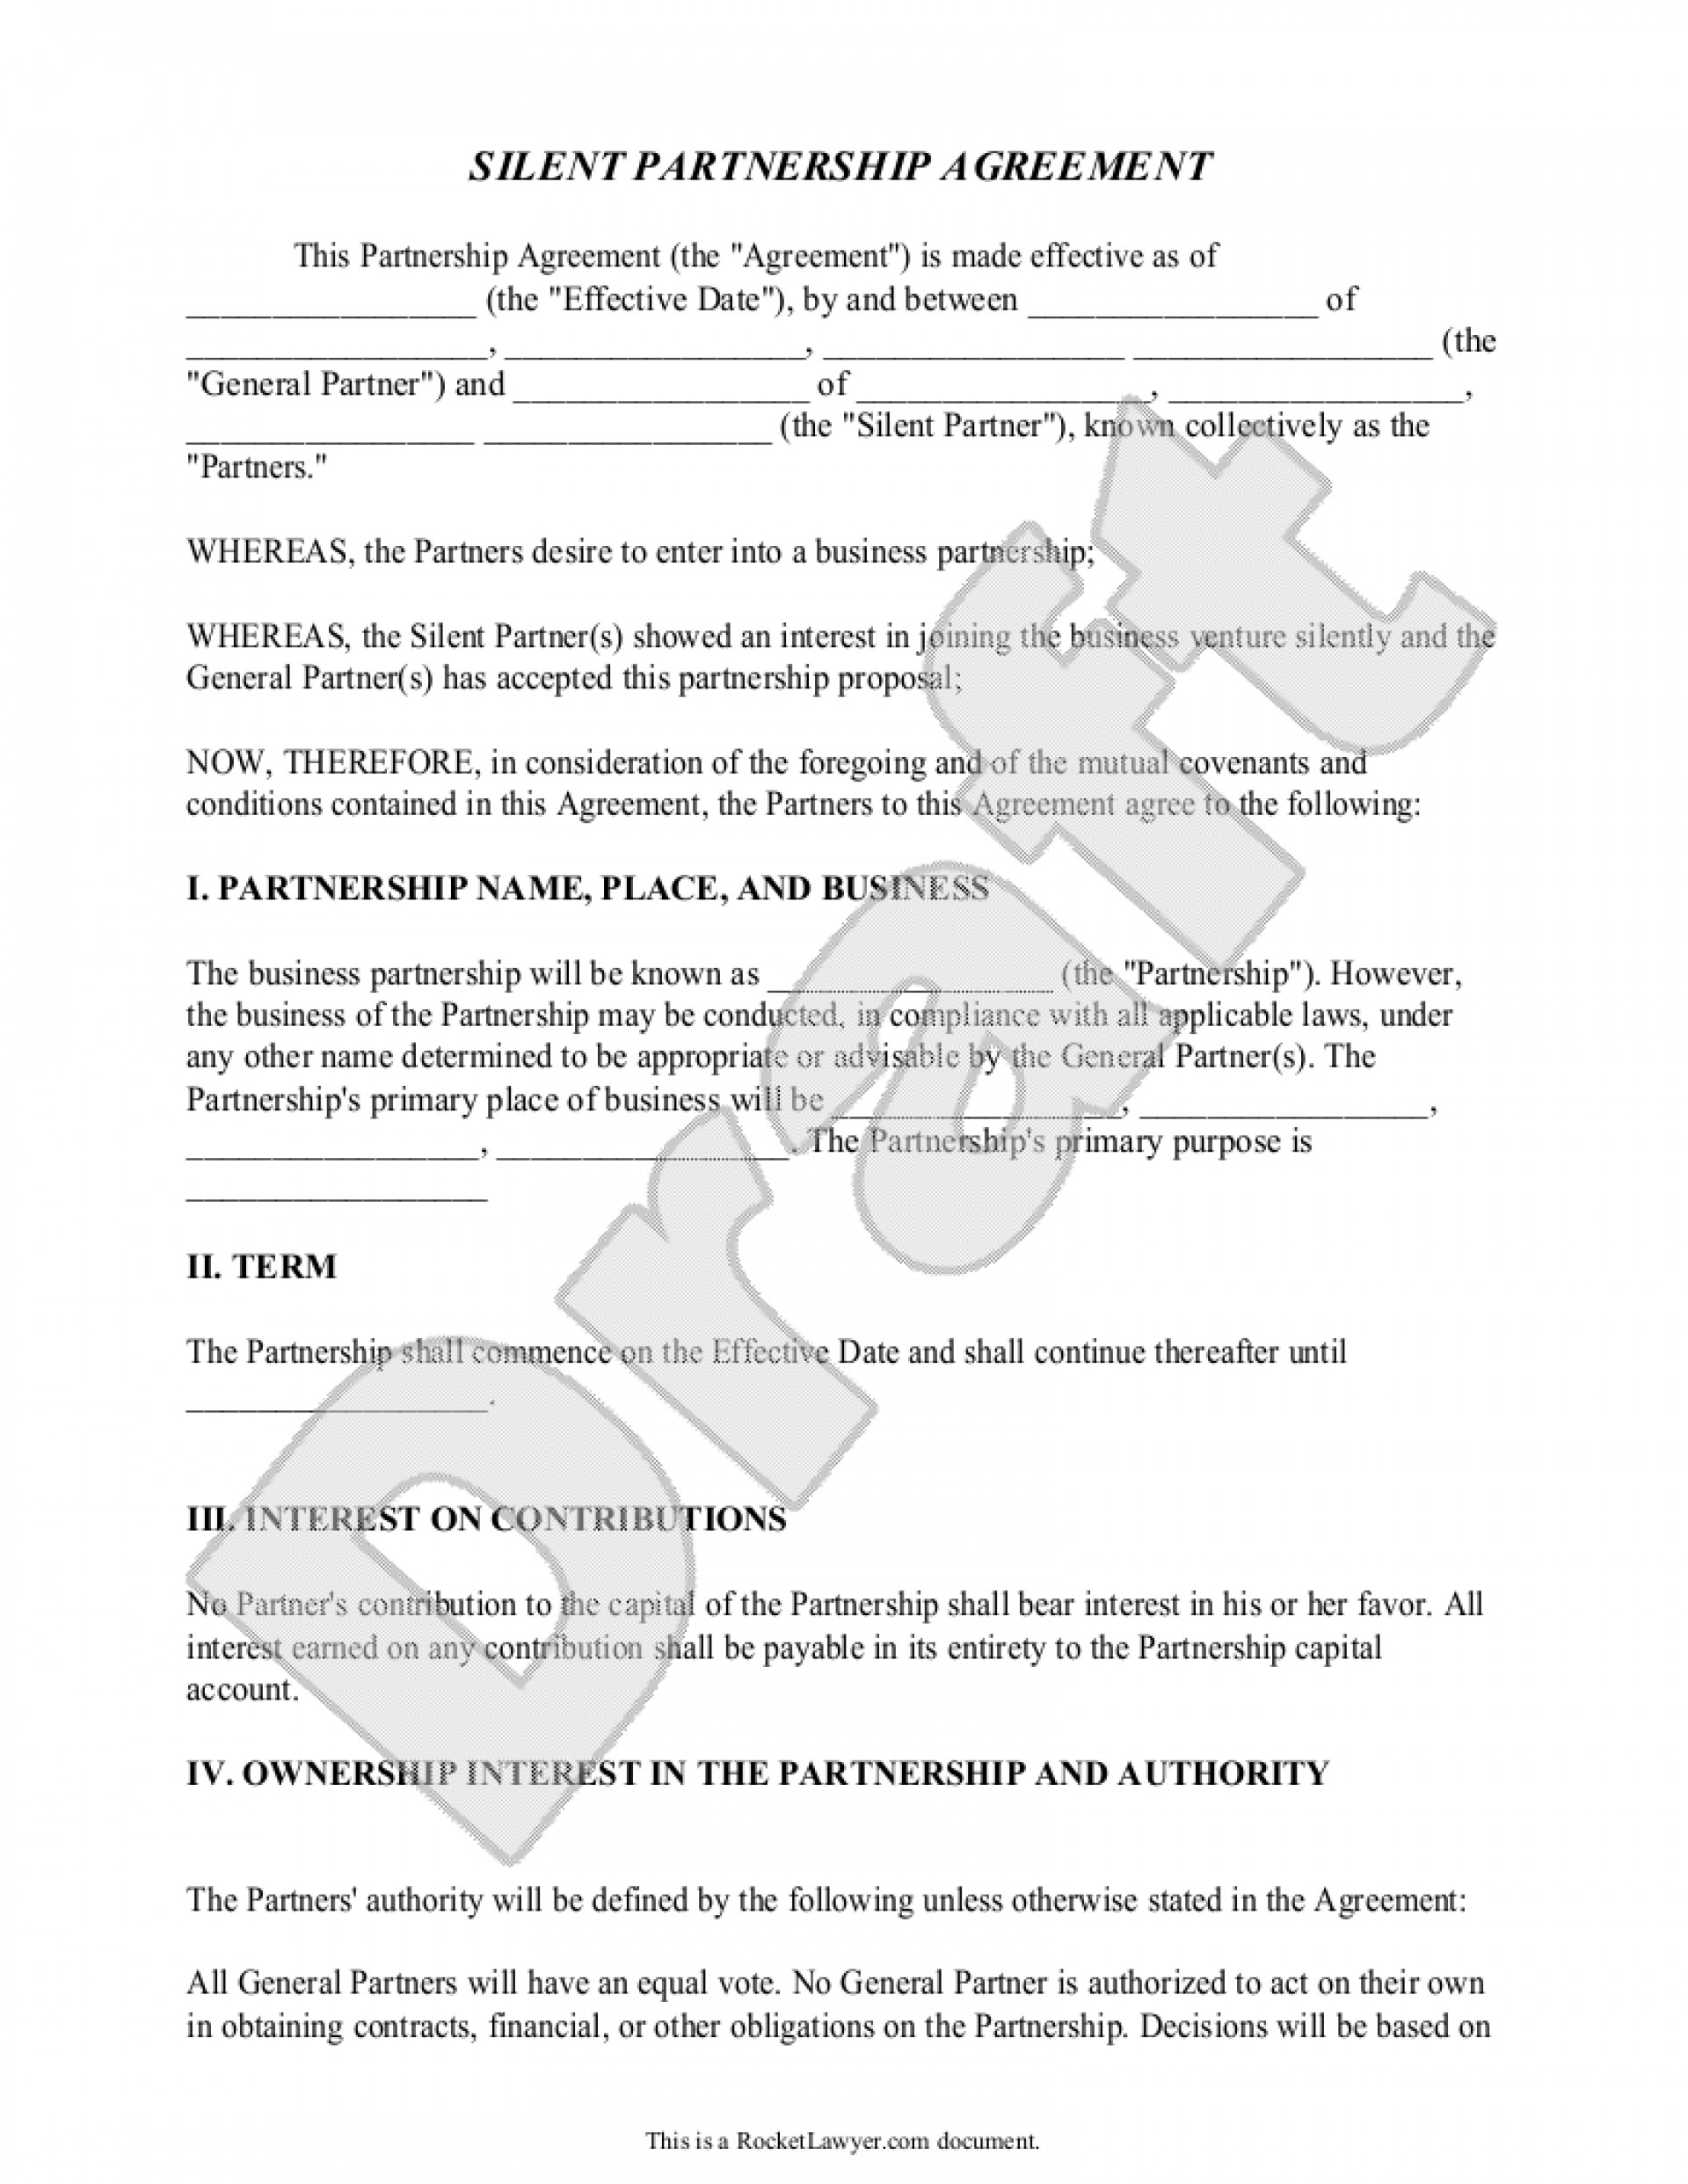 Business Partnership Agreement Template Free Rare Ideas Within Free Business Partnership Agreement Template Uk